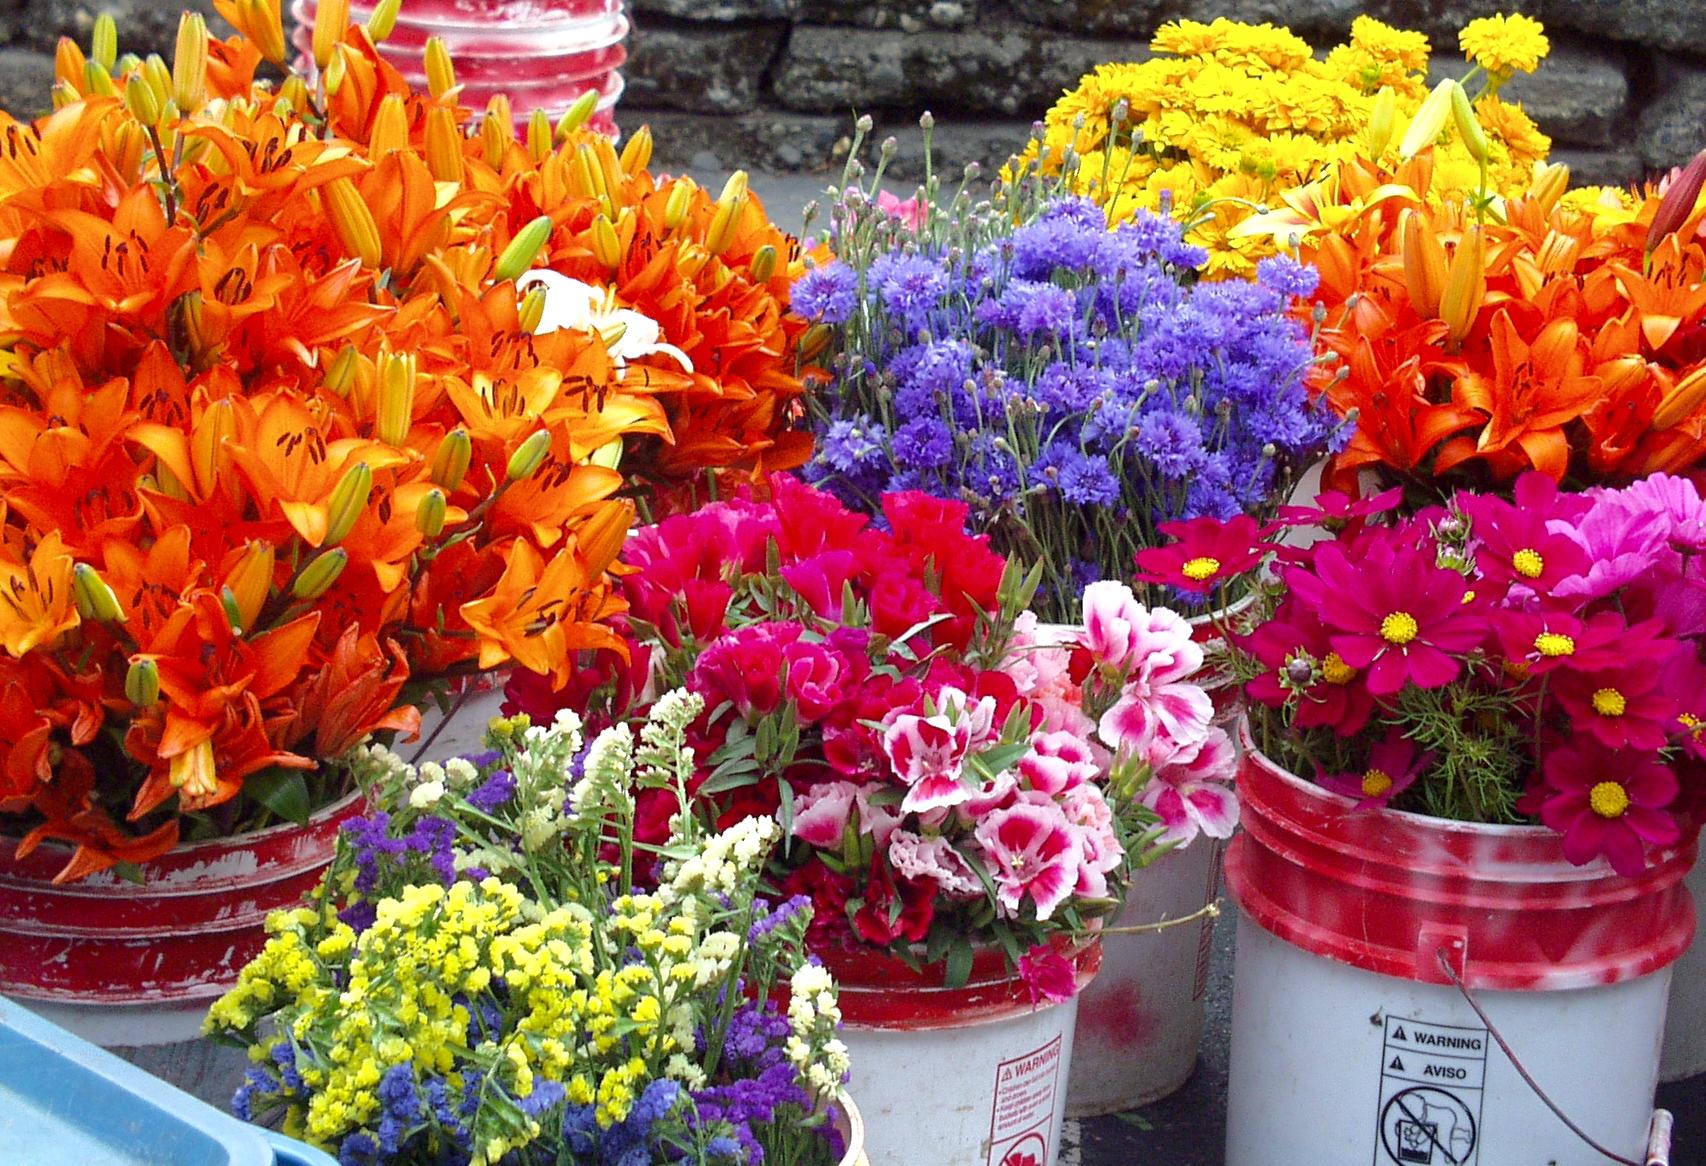 Buckets of beautiful flowers awaiting arrangement at Ia's Garden. Photo copyright 2009 by Zachary D. Lyons.